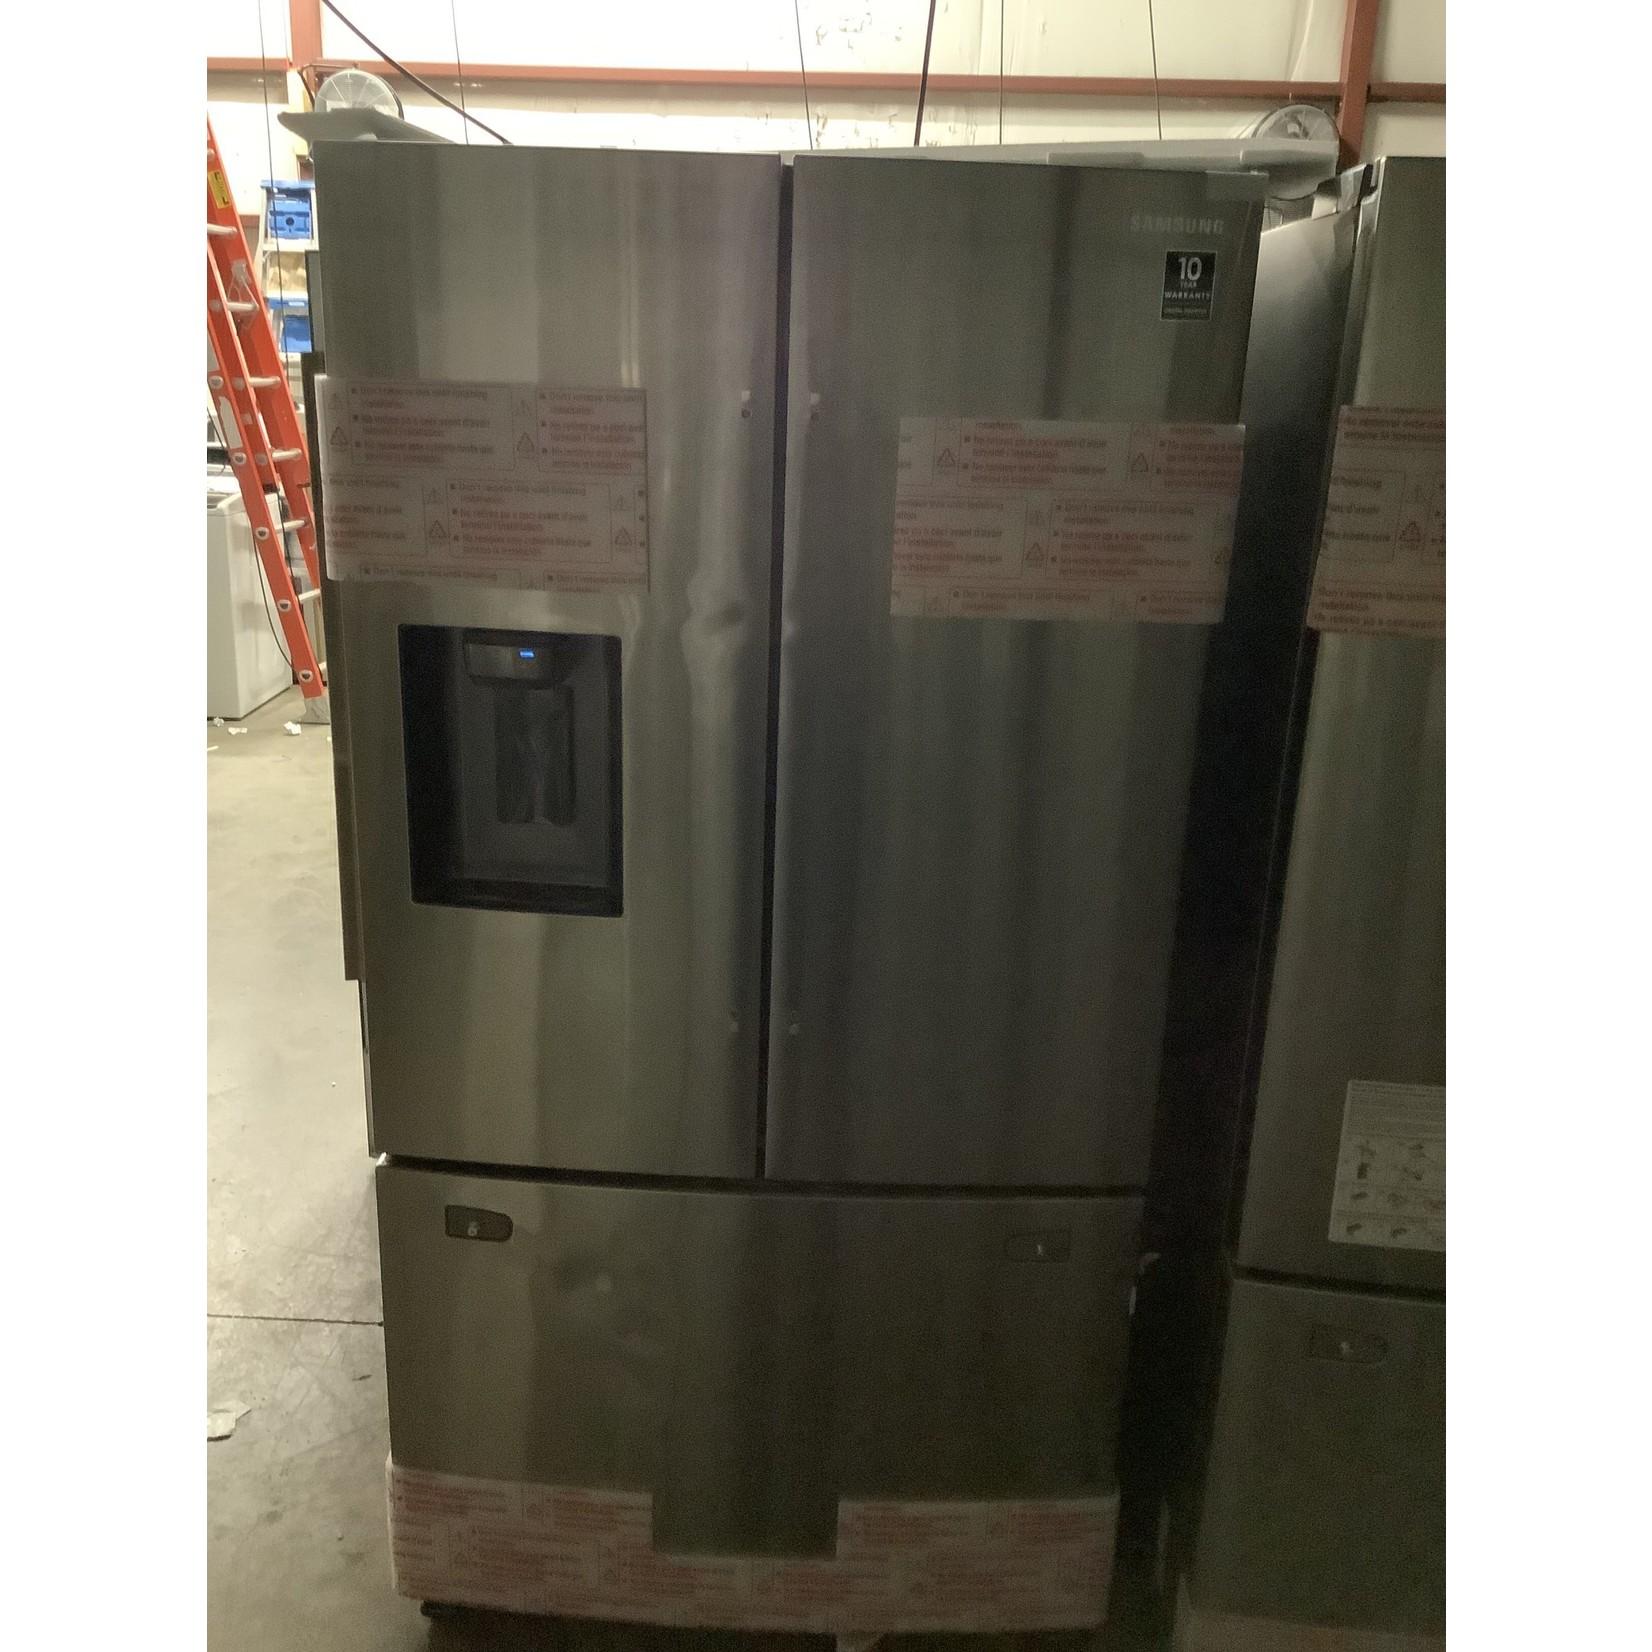 Samsung Samsung 3door refrigerator